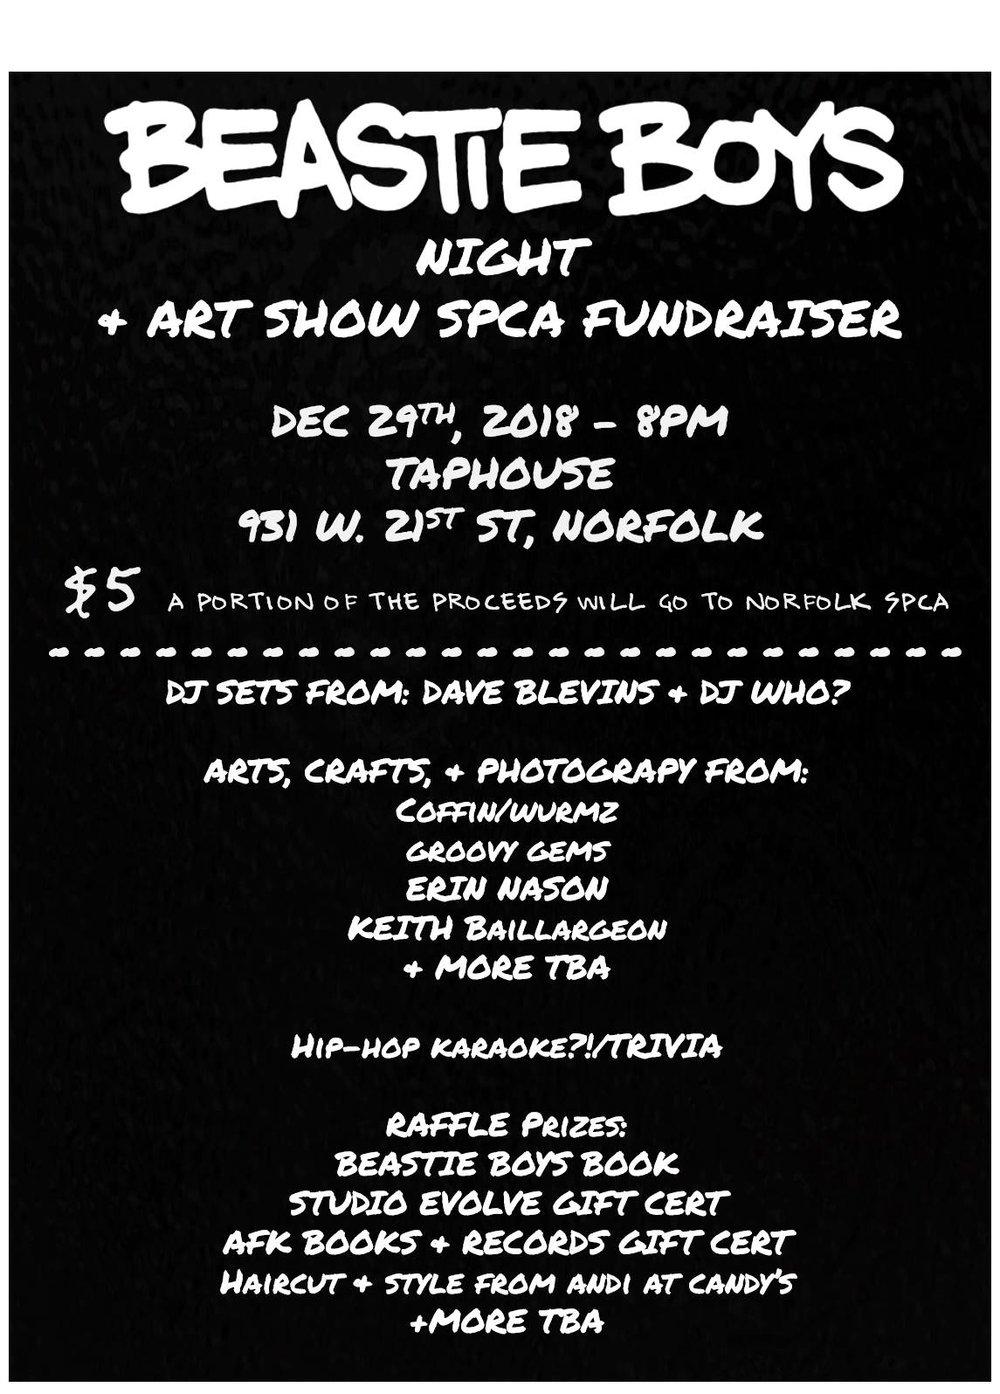 Beastie Boys Night & Art Show SPCA Fundraiser